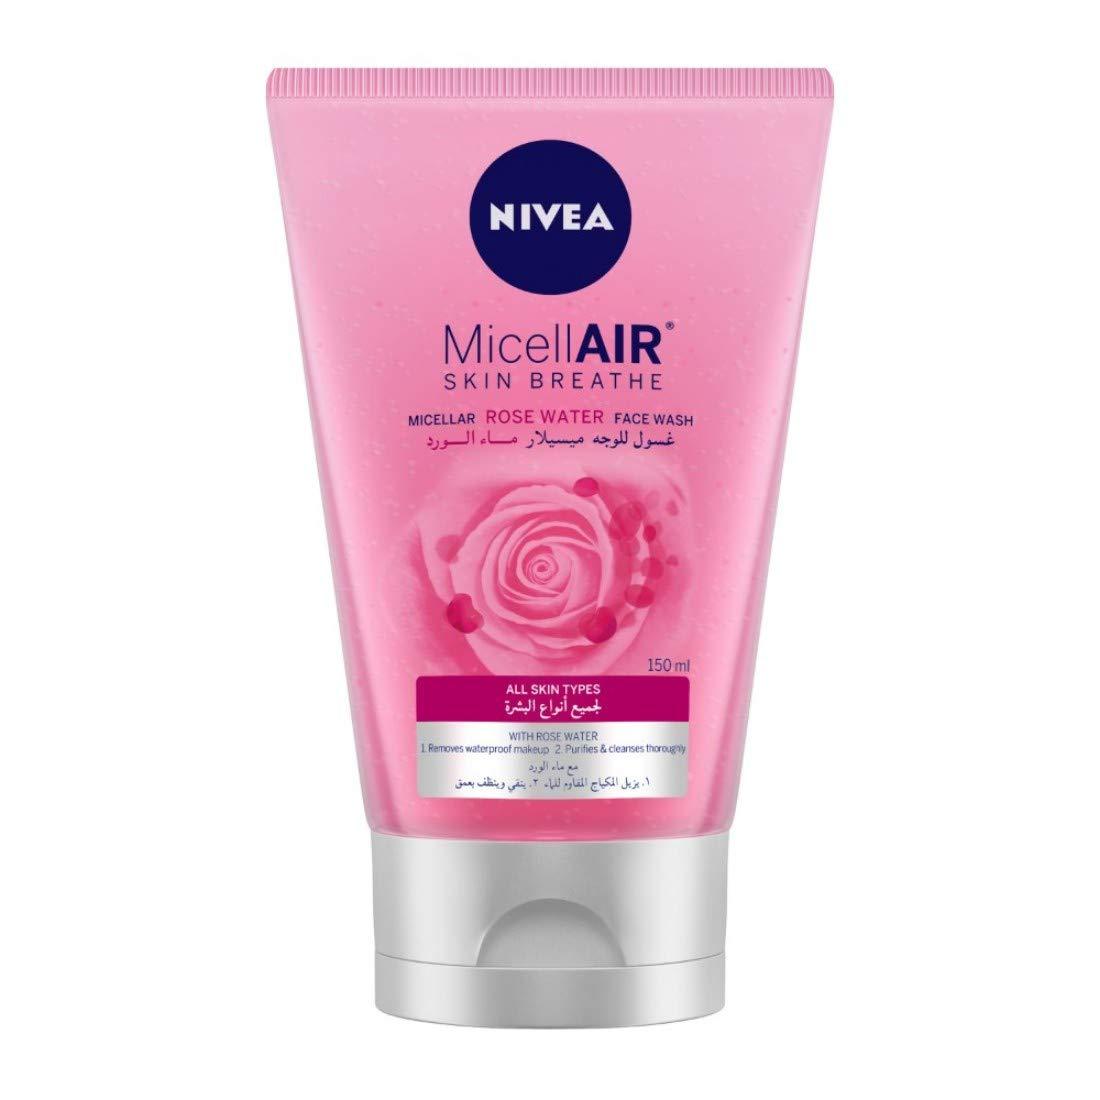 NIVEA Micellar Face Wash, MicellAIR Skin Breathe Rose Water,150ml